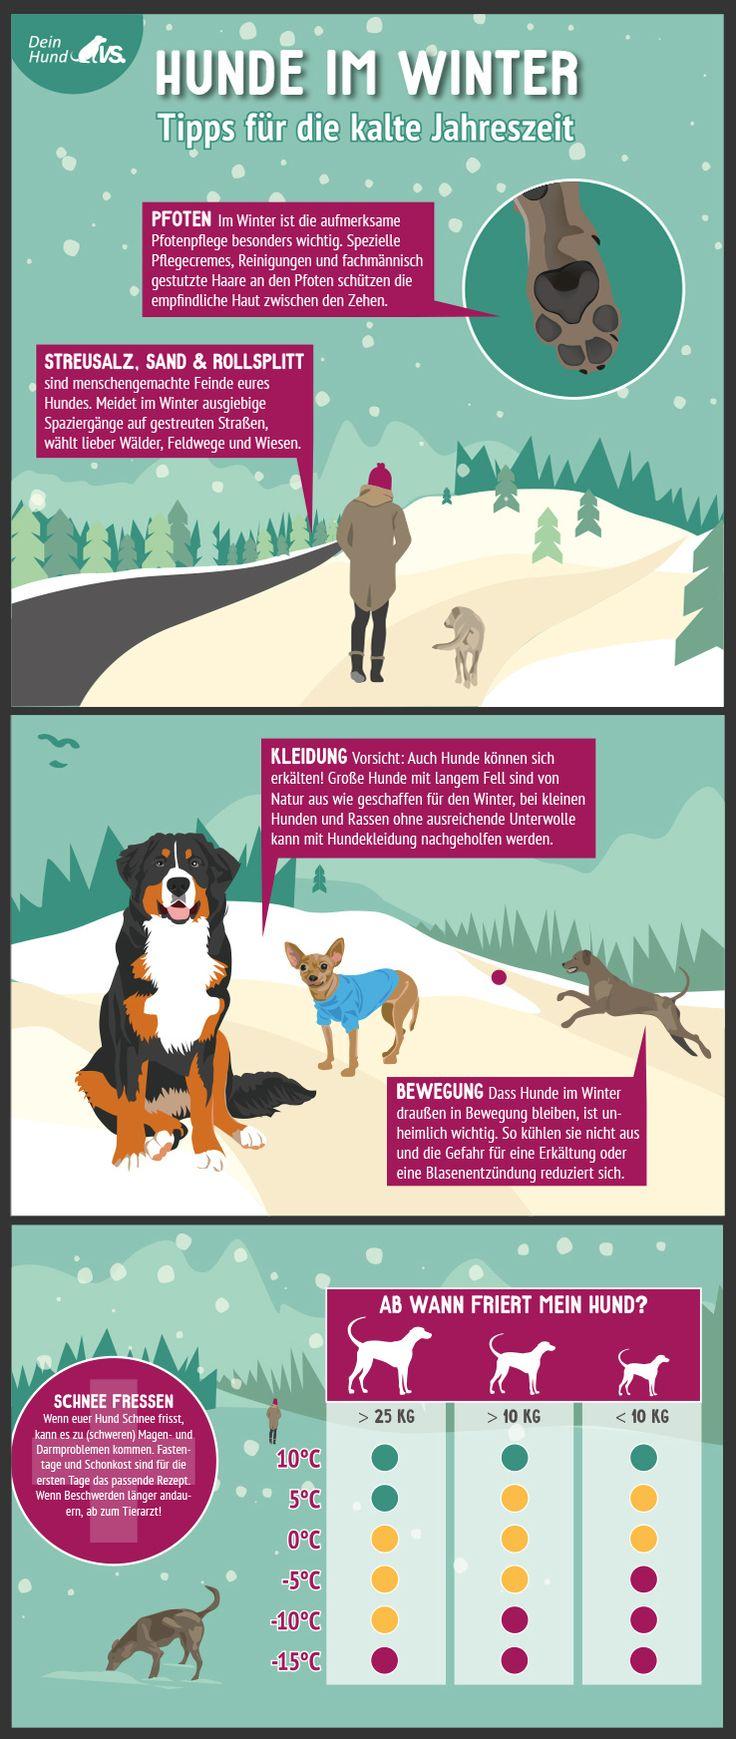 Kurze Infografik zu Besonderheiten beim Hund im Winter | www.hundeurlaub.de